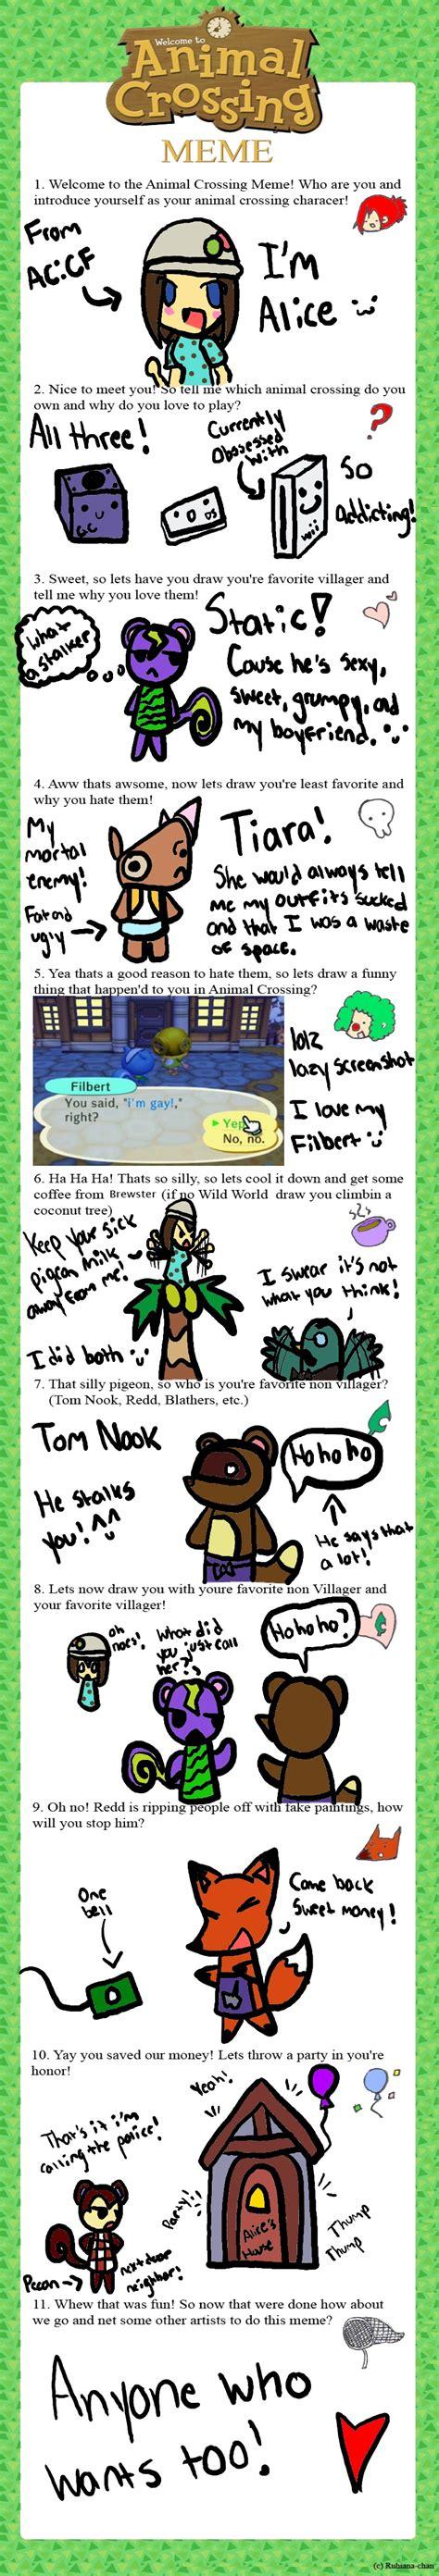 Animal Crossing Memes - animal crossing meme by miharuthekunoichi on deviantart